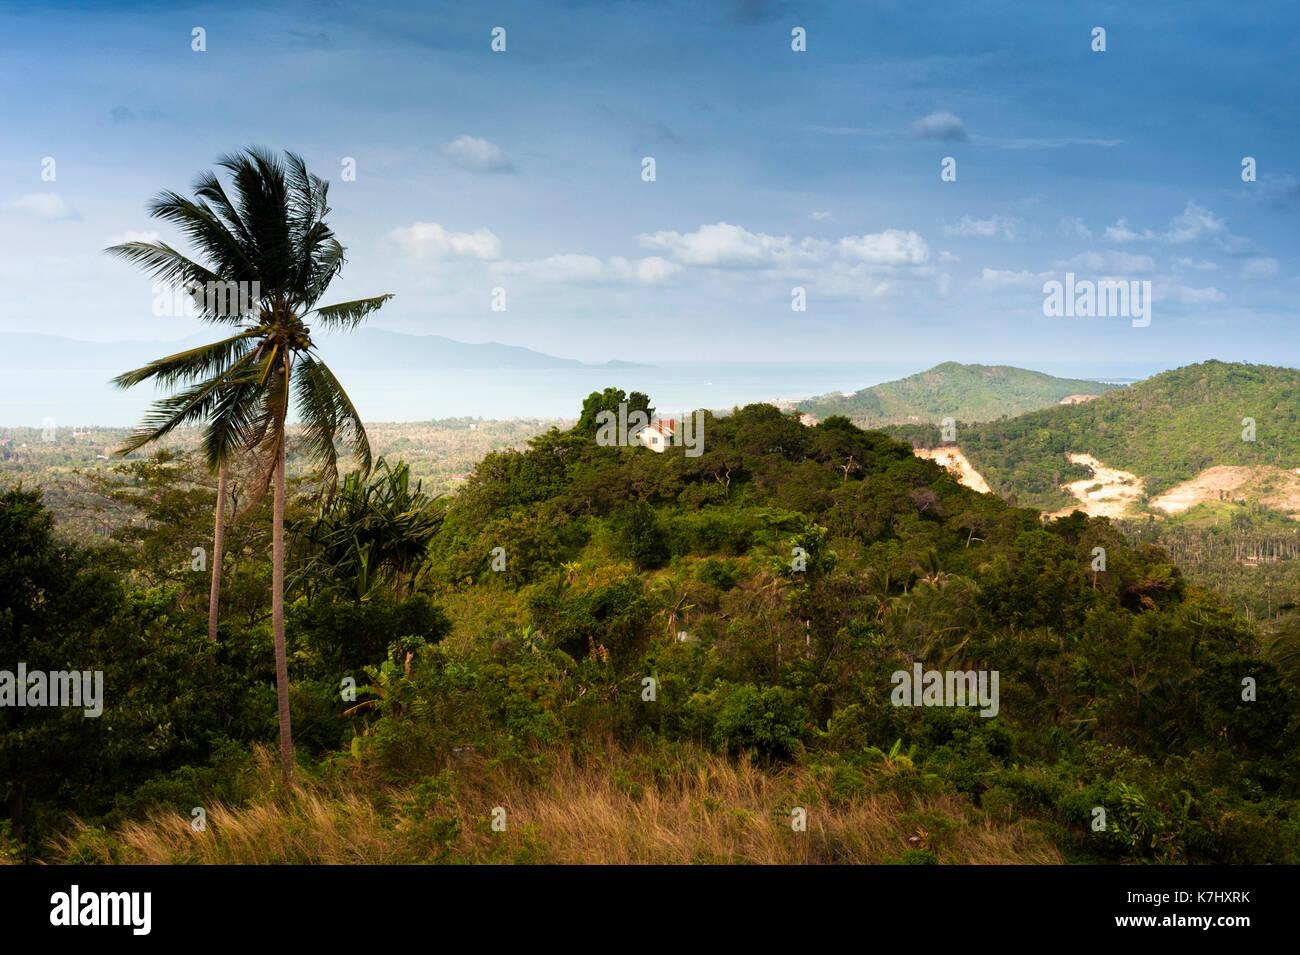 Casa con vistas sobre la isla de Koh Samui, Tailandia Imagen De Stock